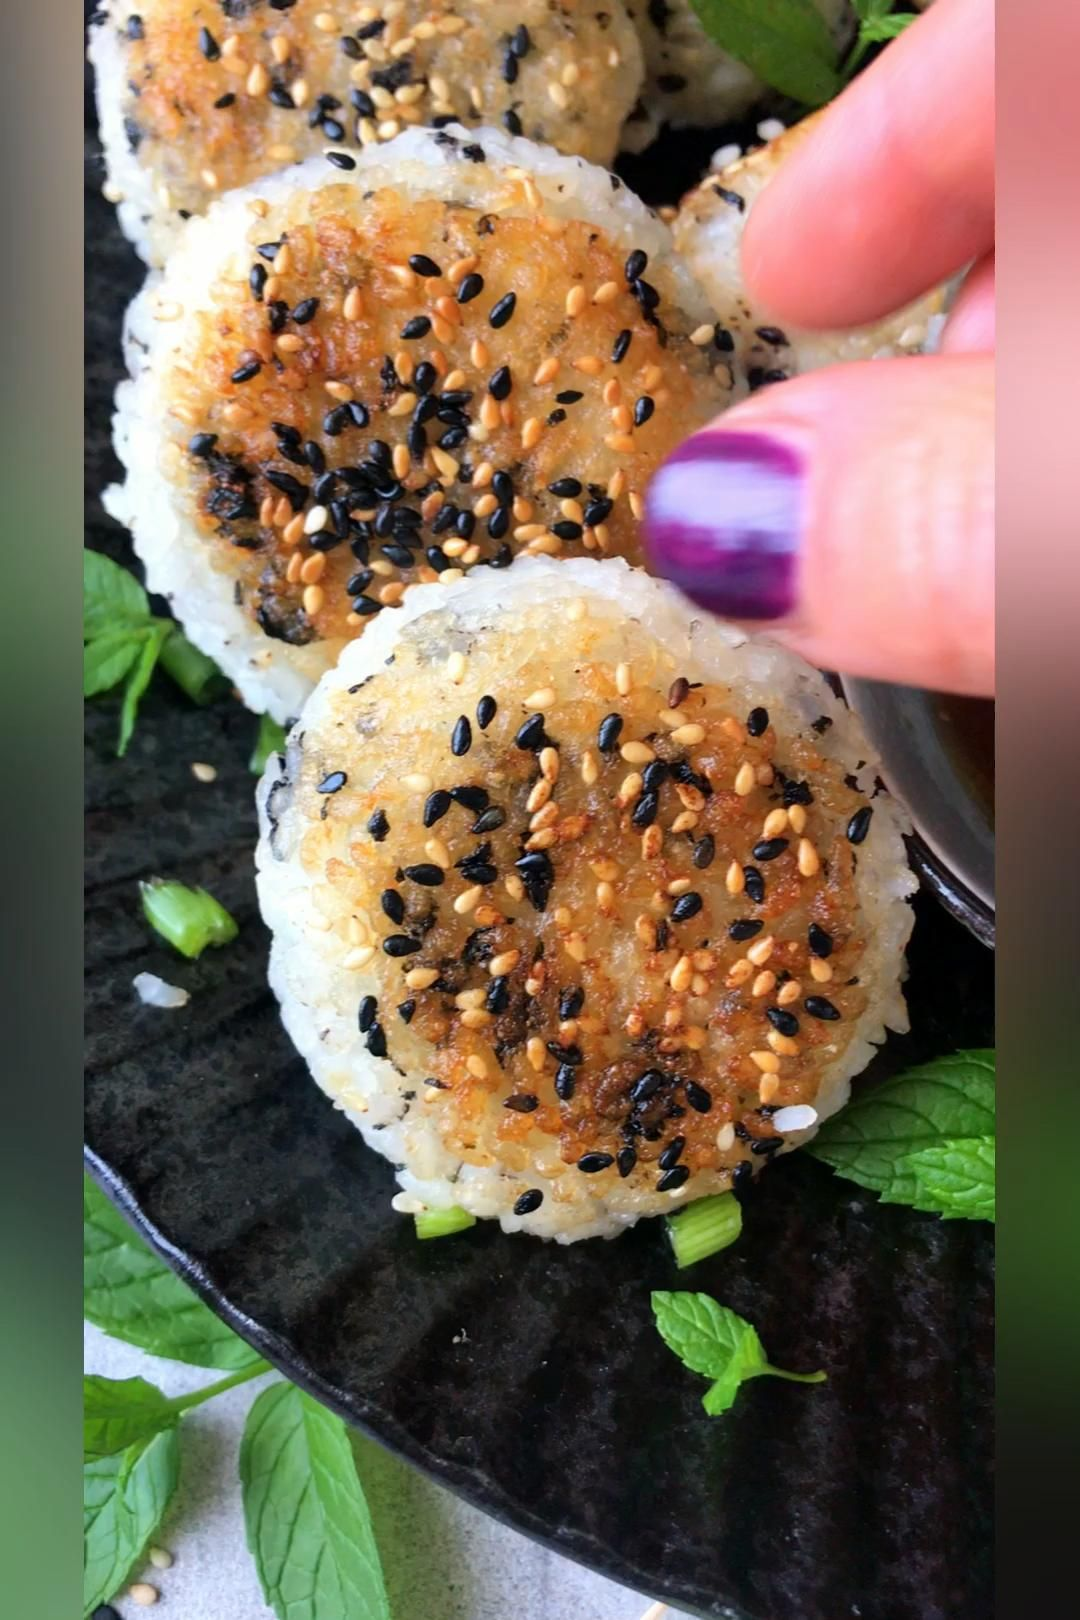 Japanese Yaki Onigiri - Crispy grilled rice balls